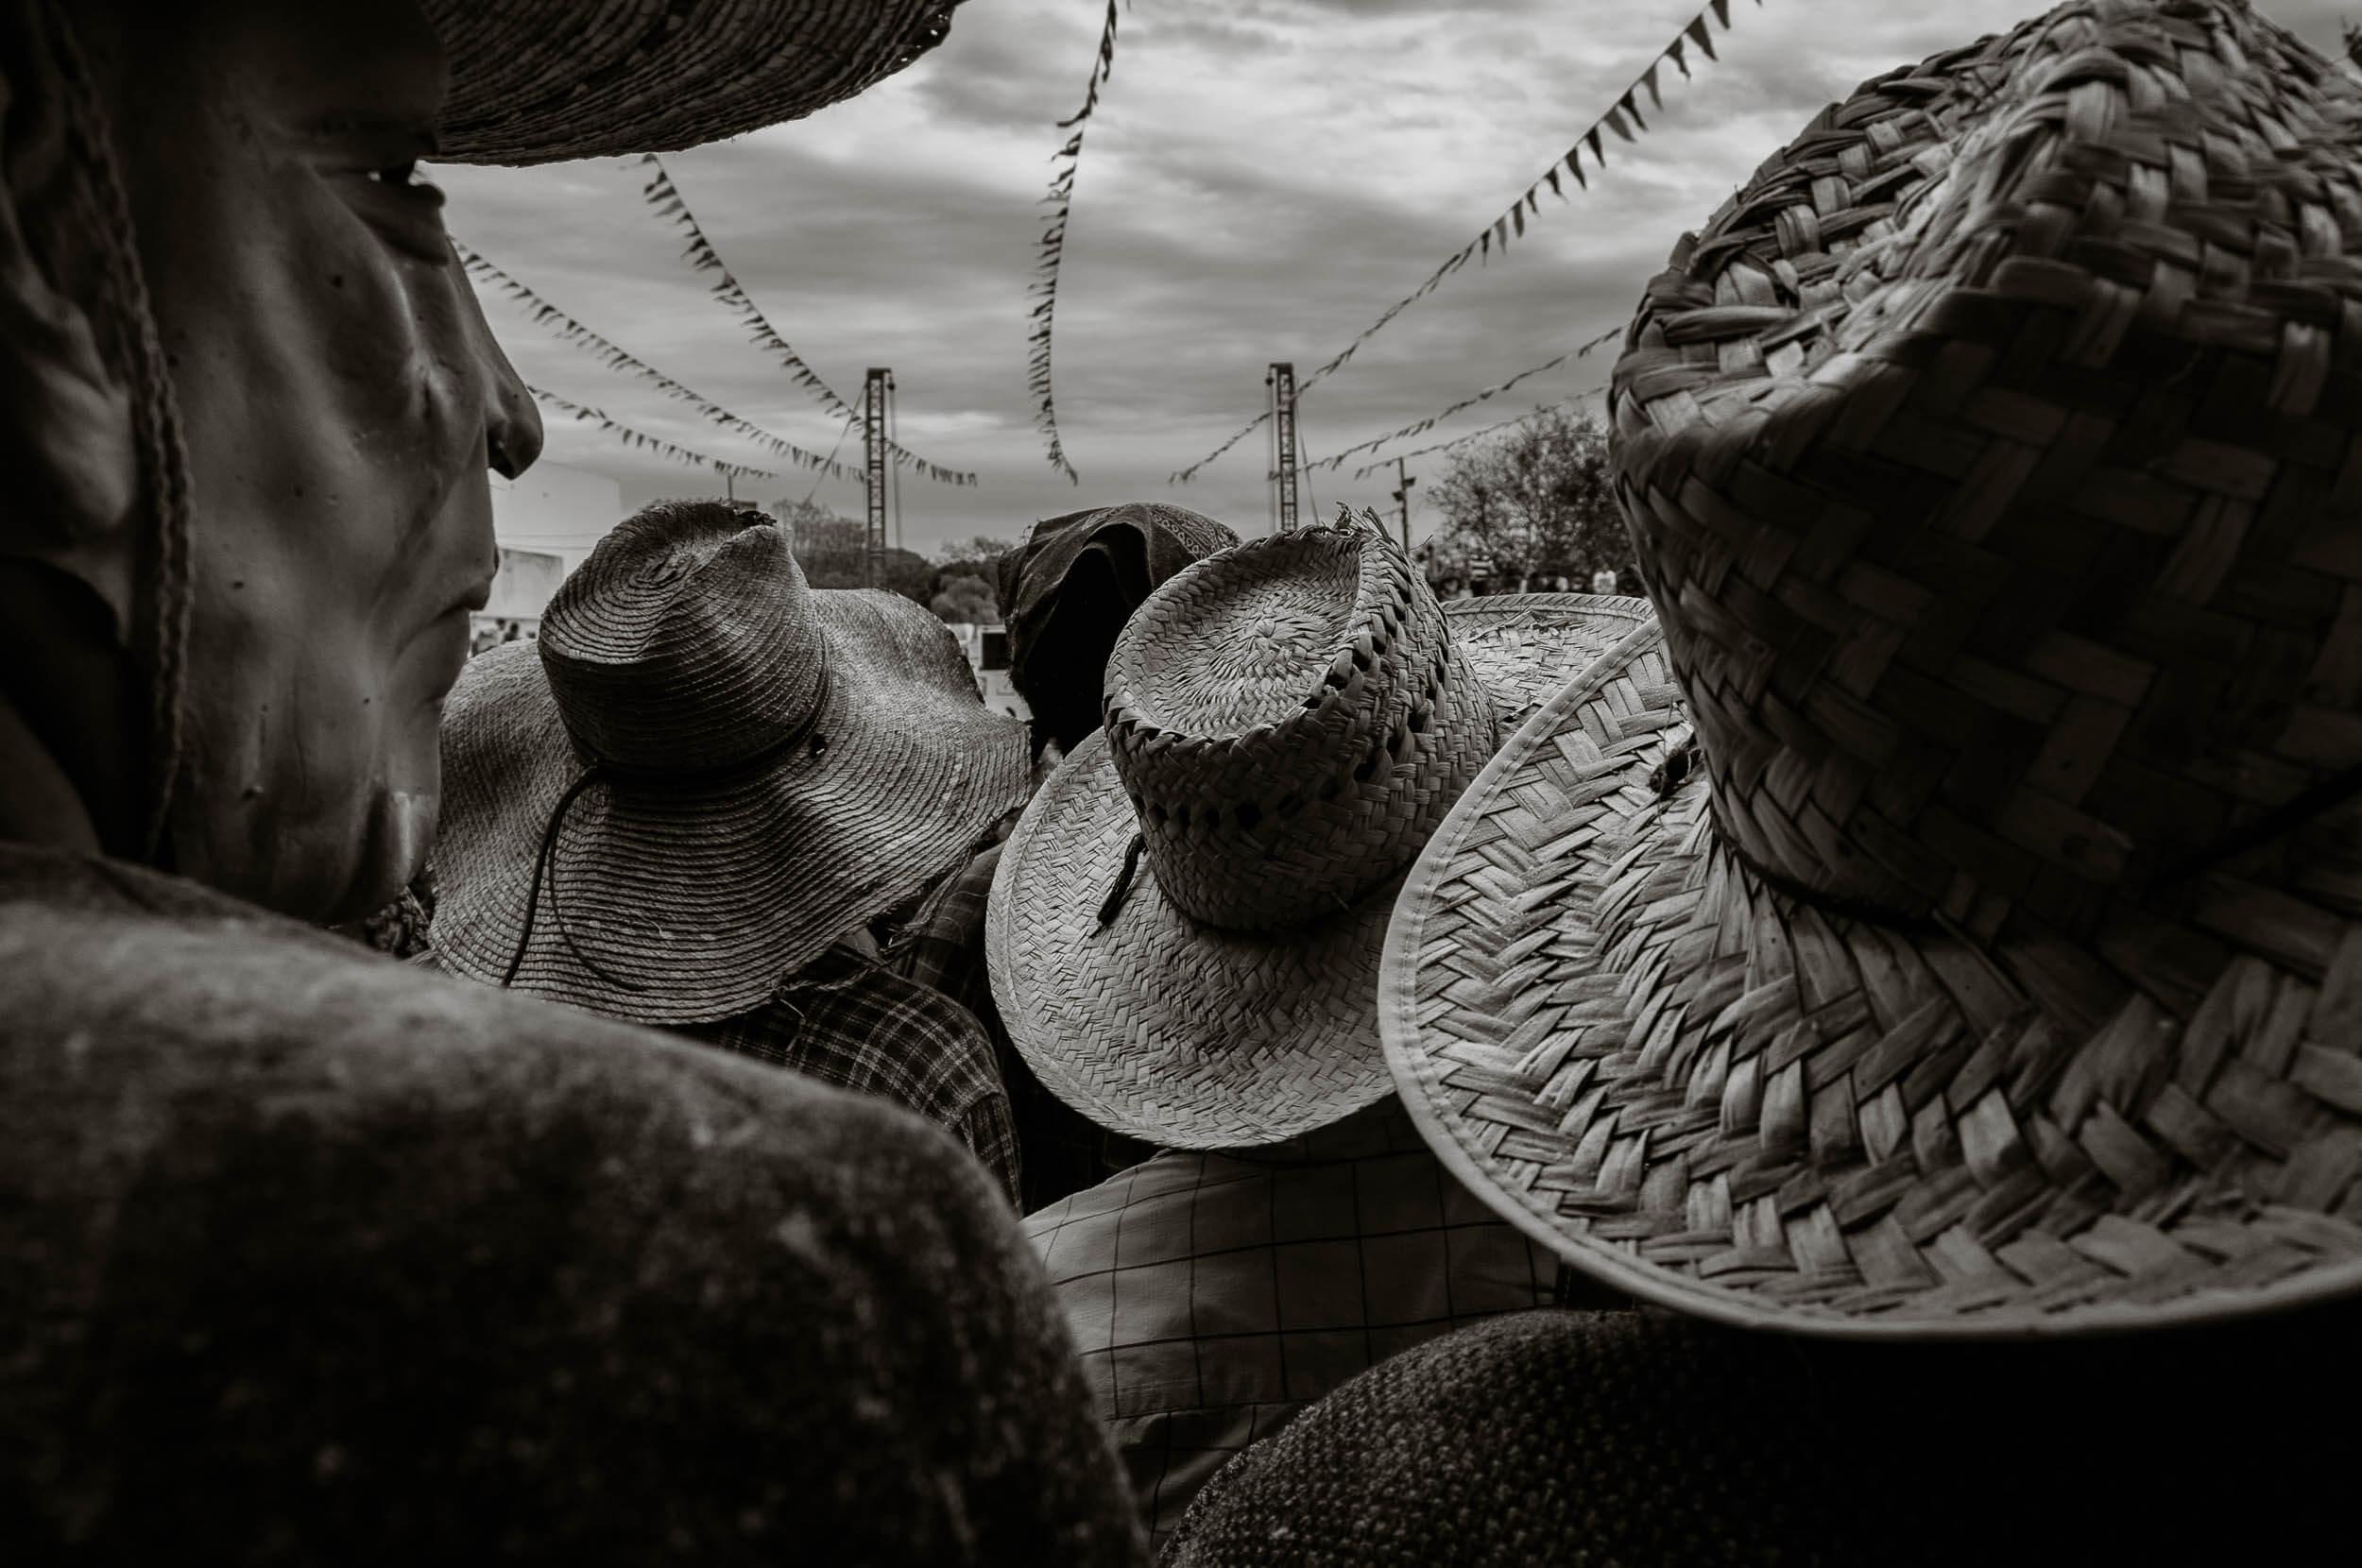 The Masked Zayacos of Ajijic